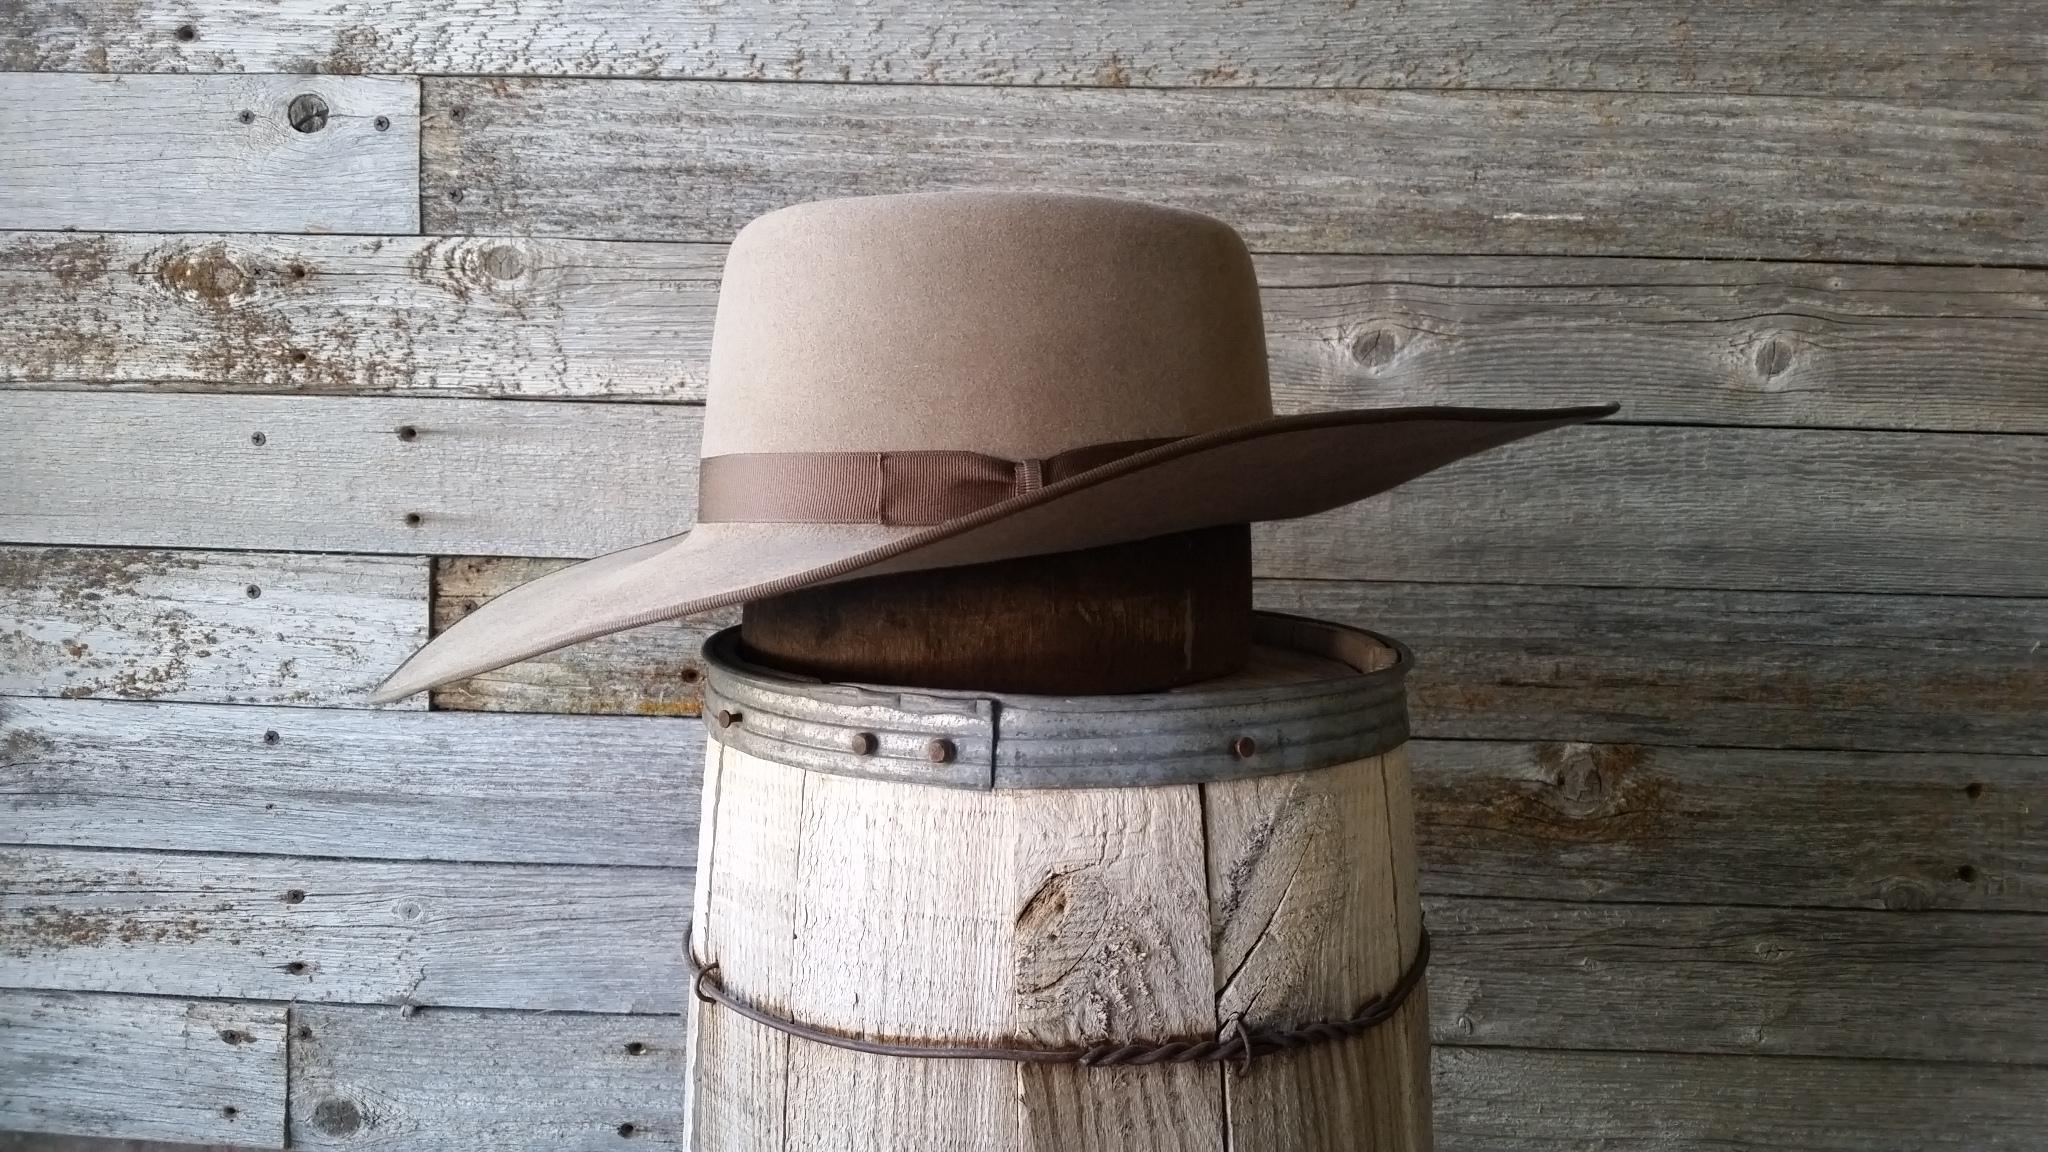 Cowboy Hats In Ogden Utah - Staker Hats